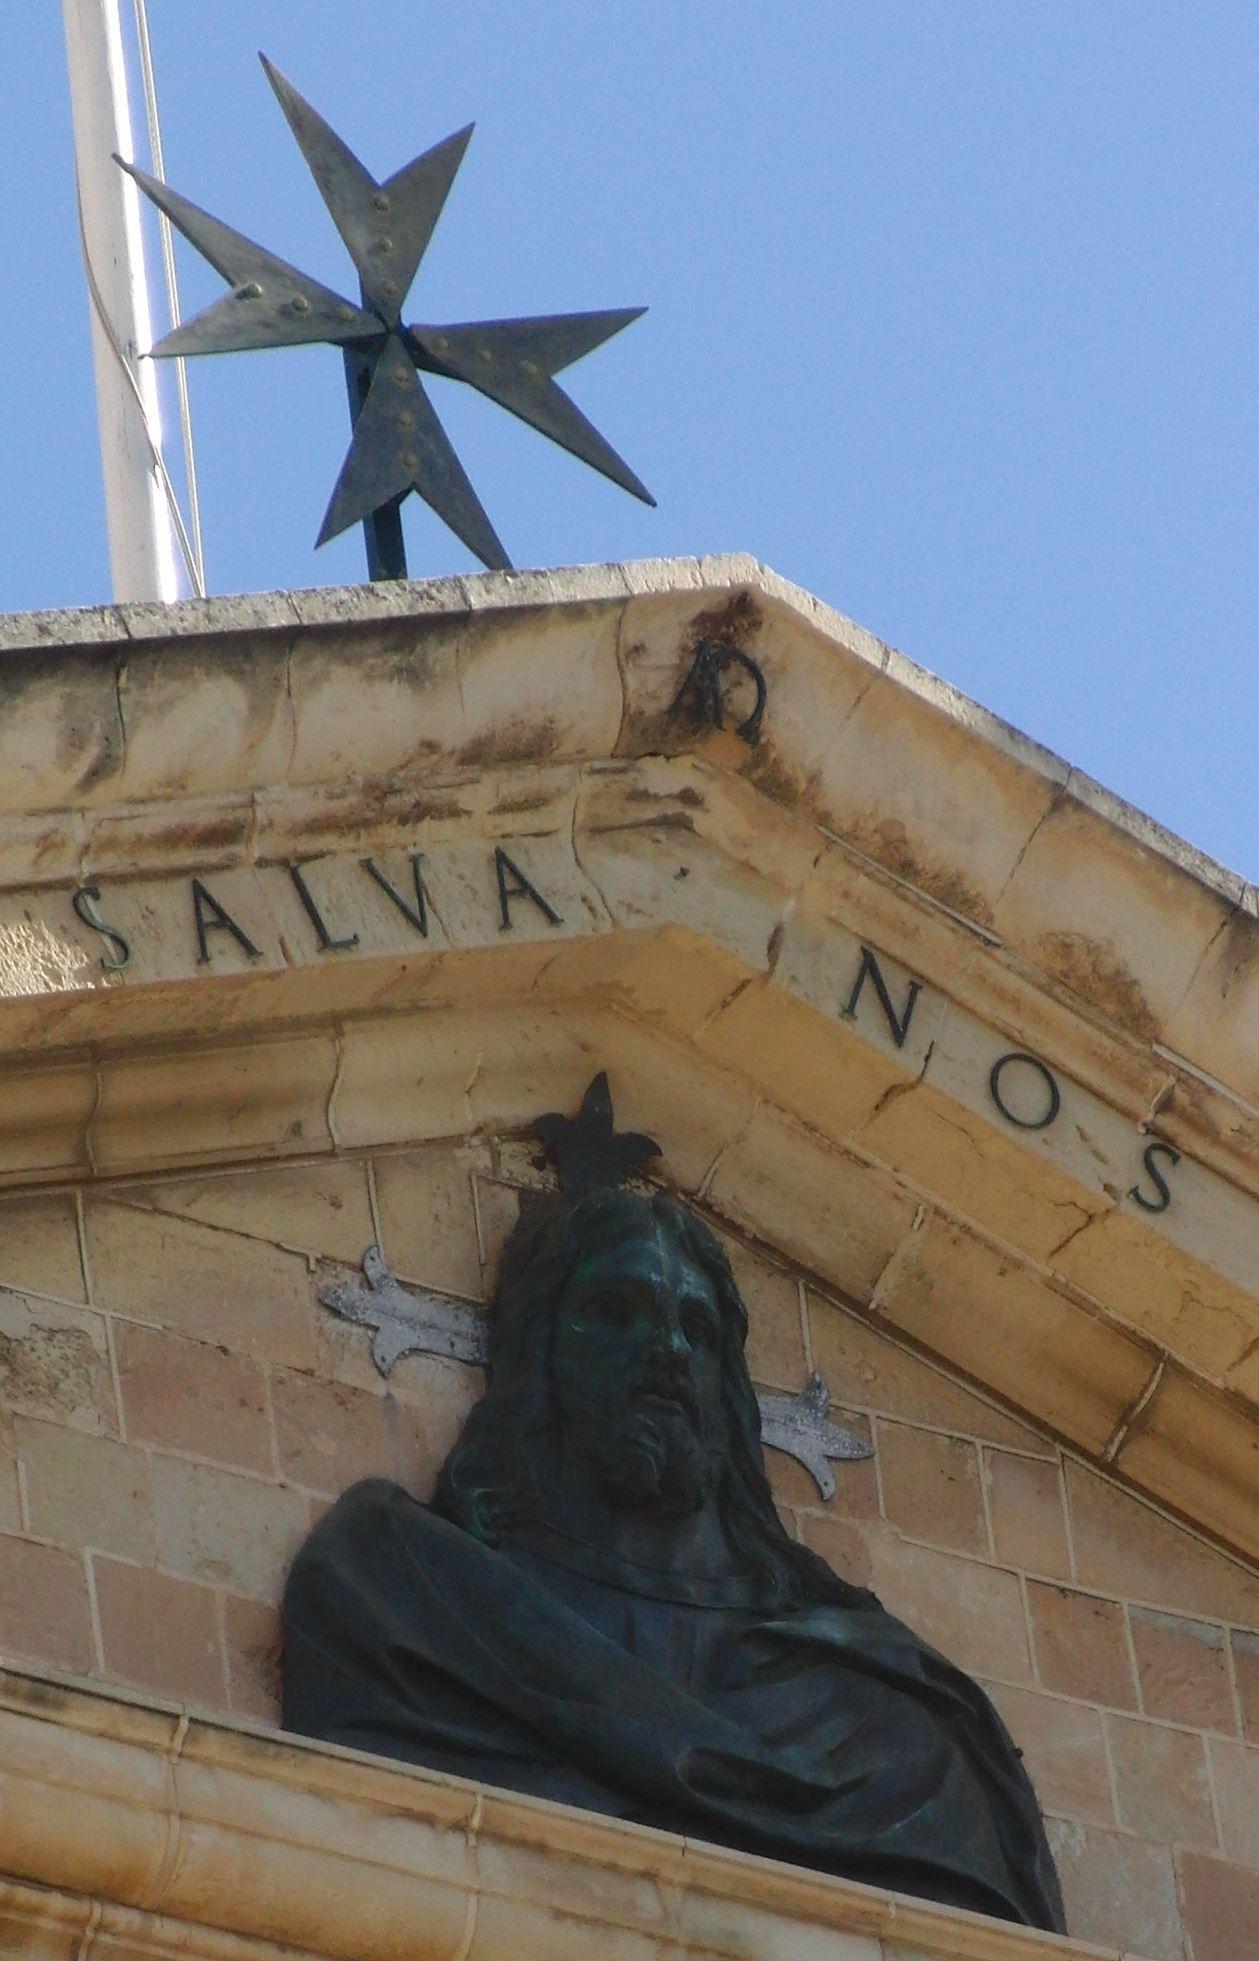 Malteserkreuz auf Malta